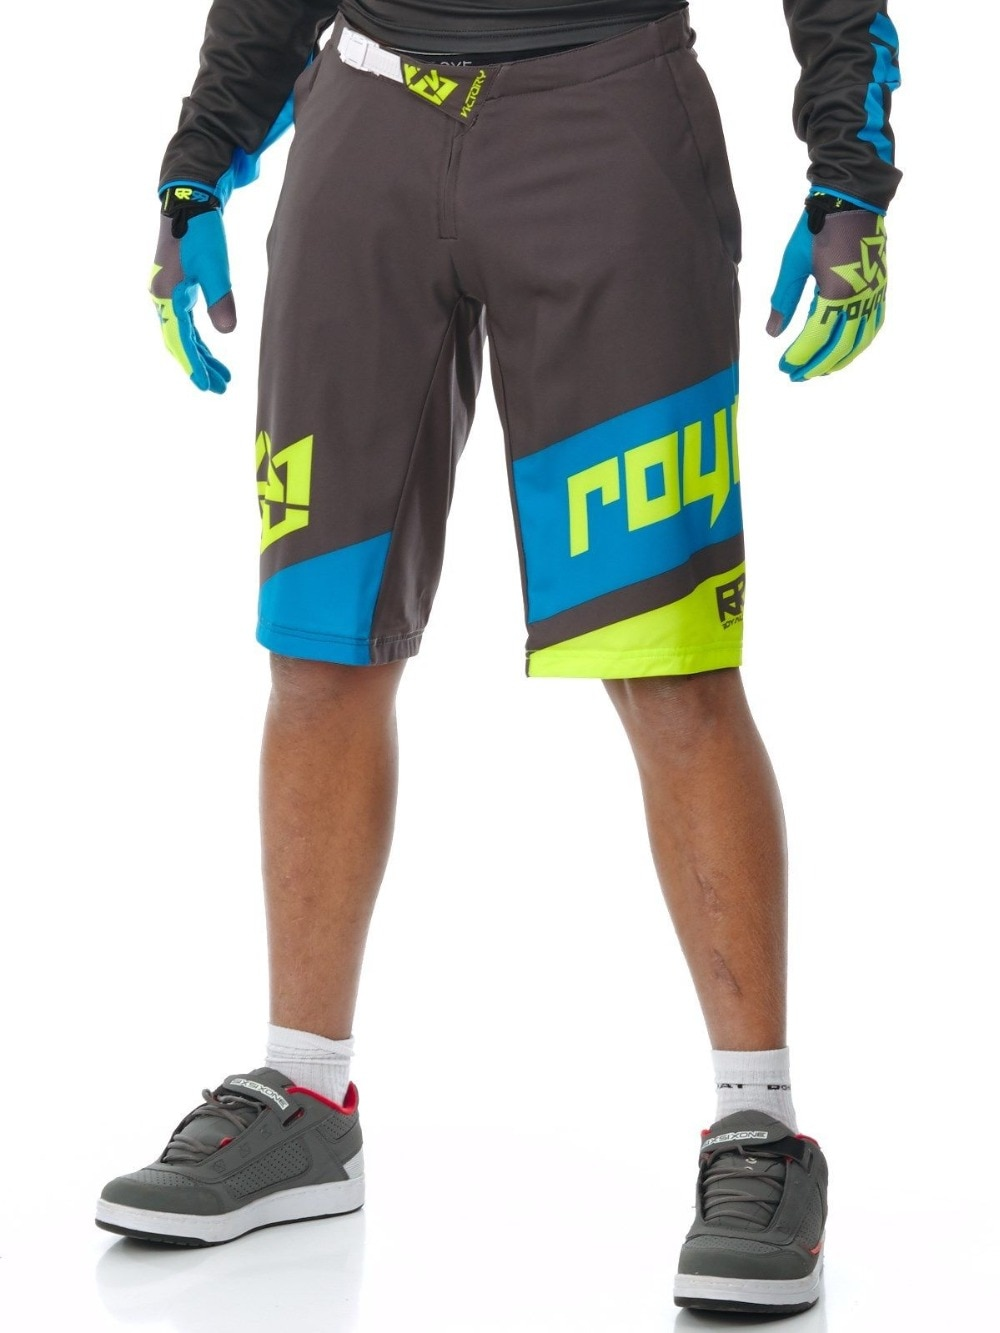 2019 nuevos pantalones de Motocross pantalones cortos para motocicleta pantalones cortos para bicicleta todo terreno MTB MX DH pantalones cortos para bicicleta de montaña.